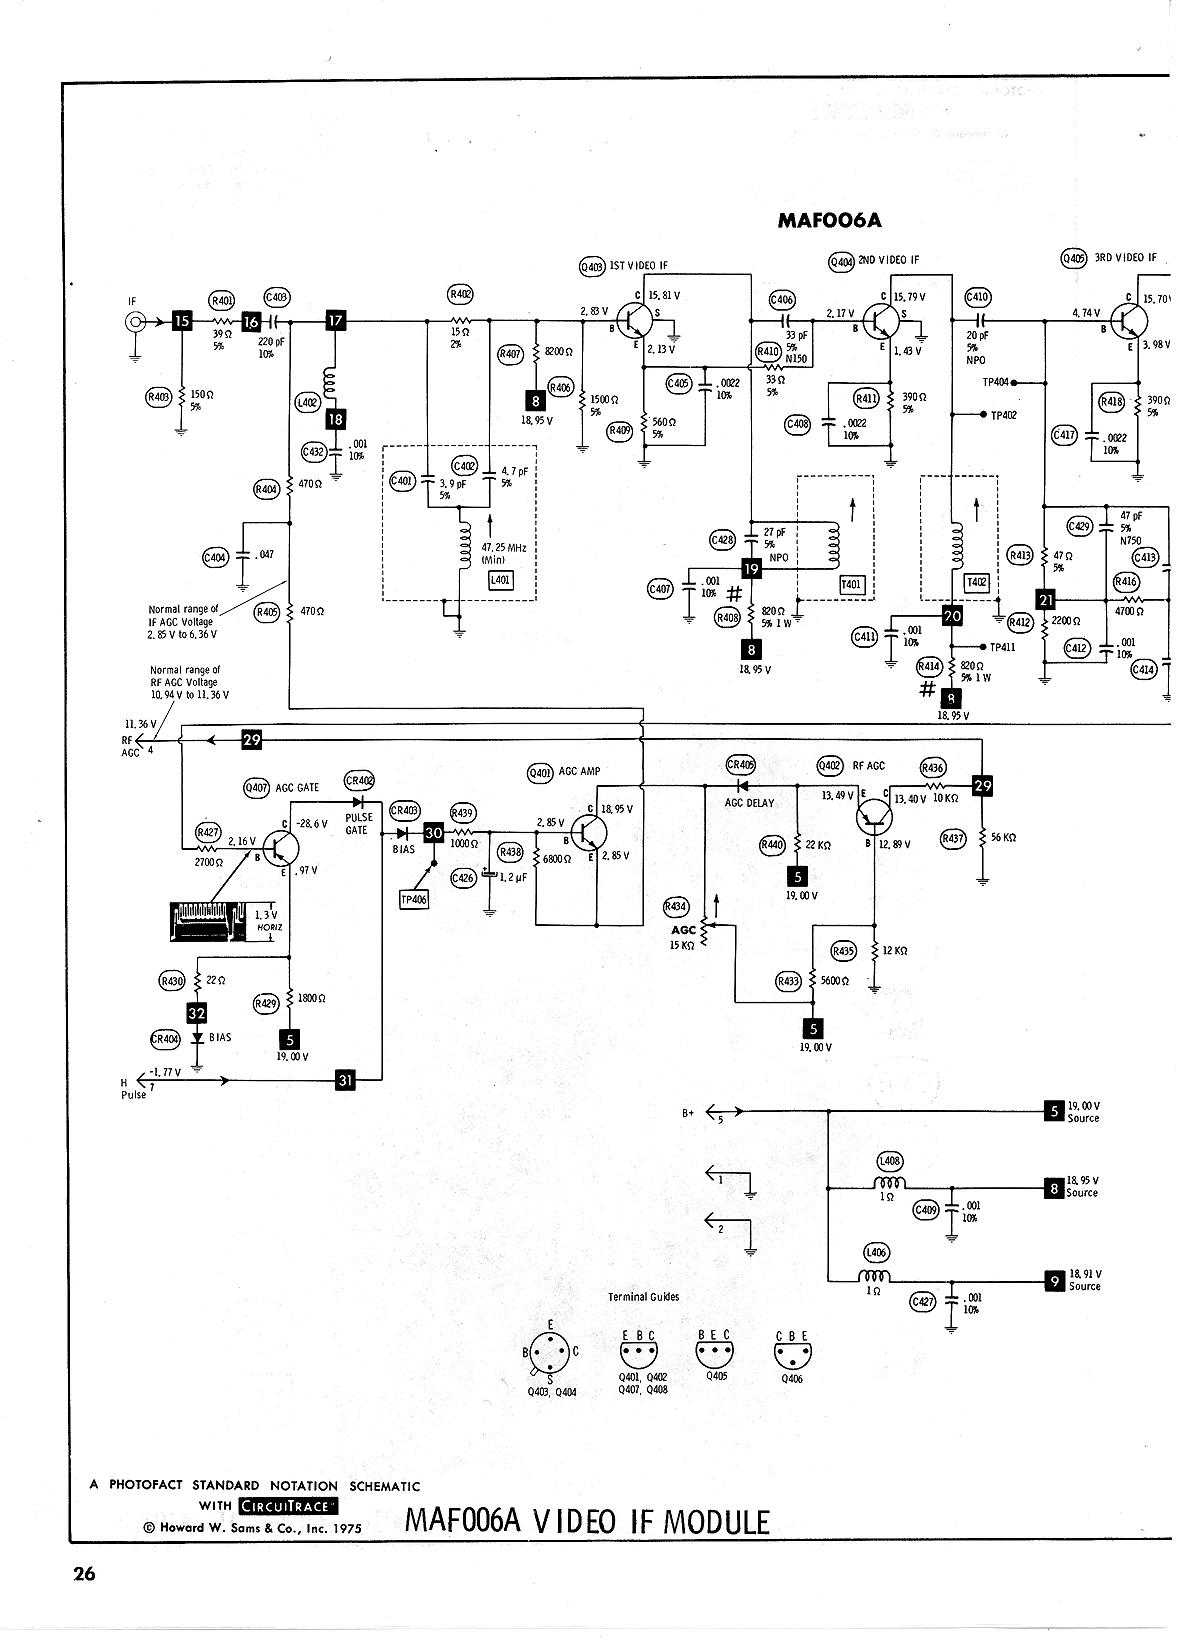 Hitachi Tv Schematic Automotive Wiring Diagram Circuit Index Of Manuals Pong Rh Games Rossiters Com Excavators